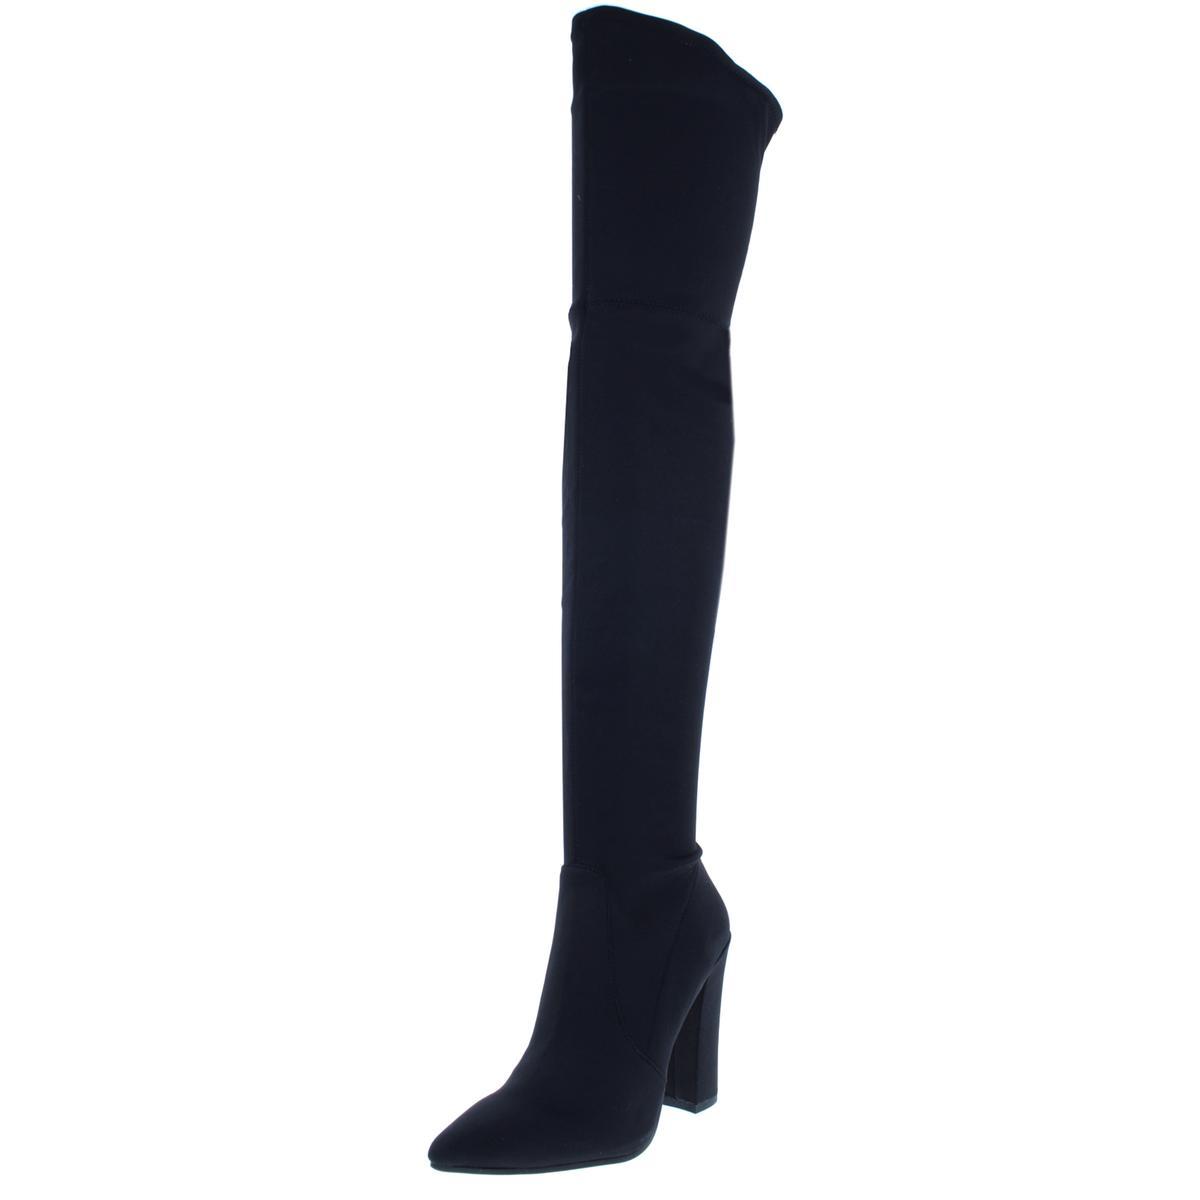 7d56c5dcddd Details about Dolce Vita Womens Ellis Black Thigh-High Boots Shoes 6 Medium  (B